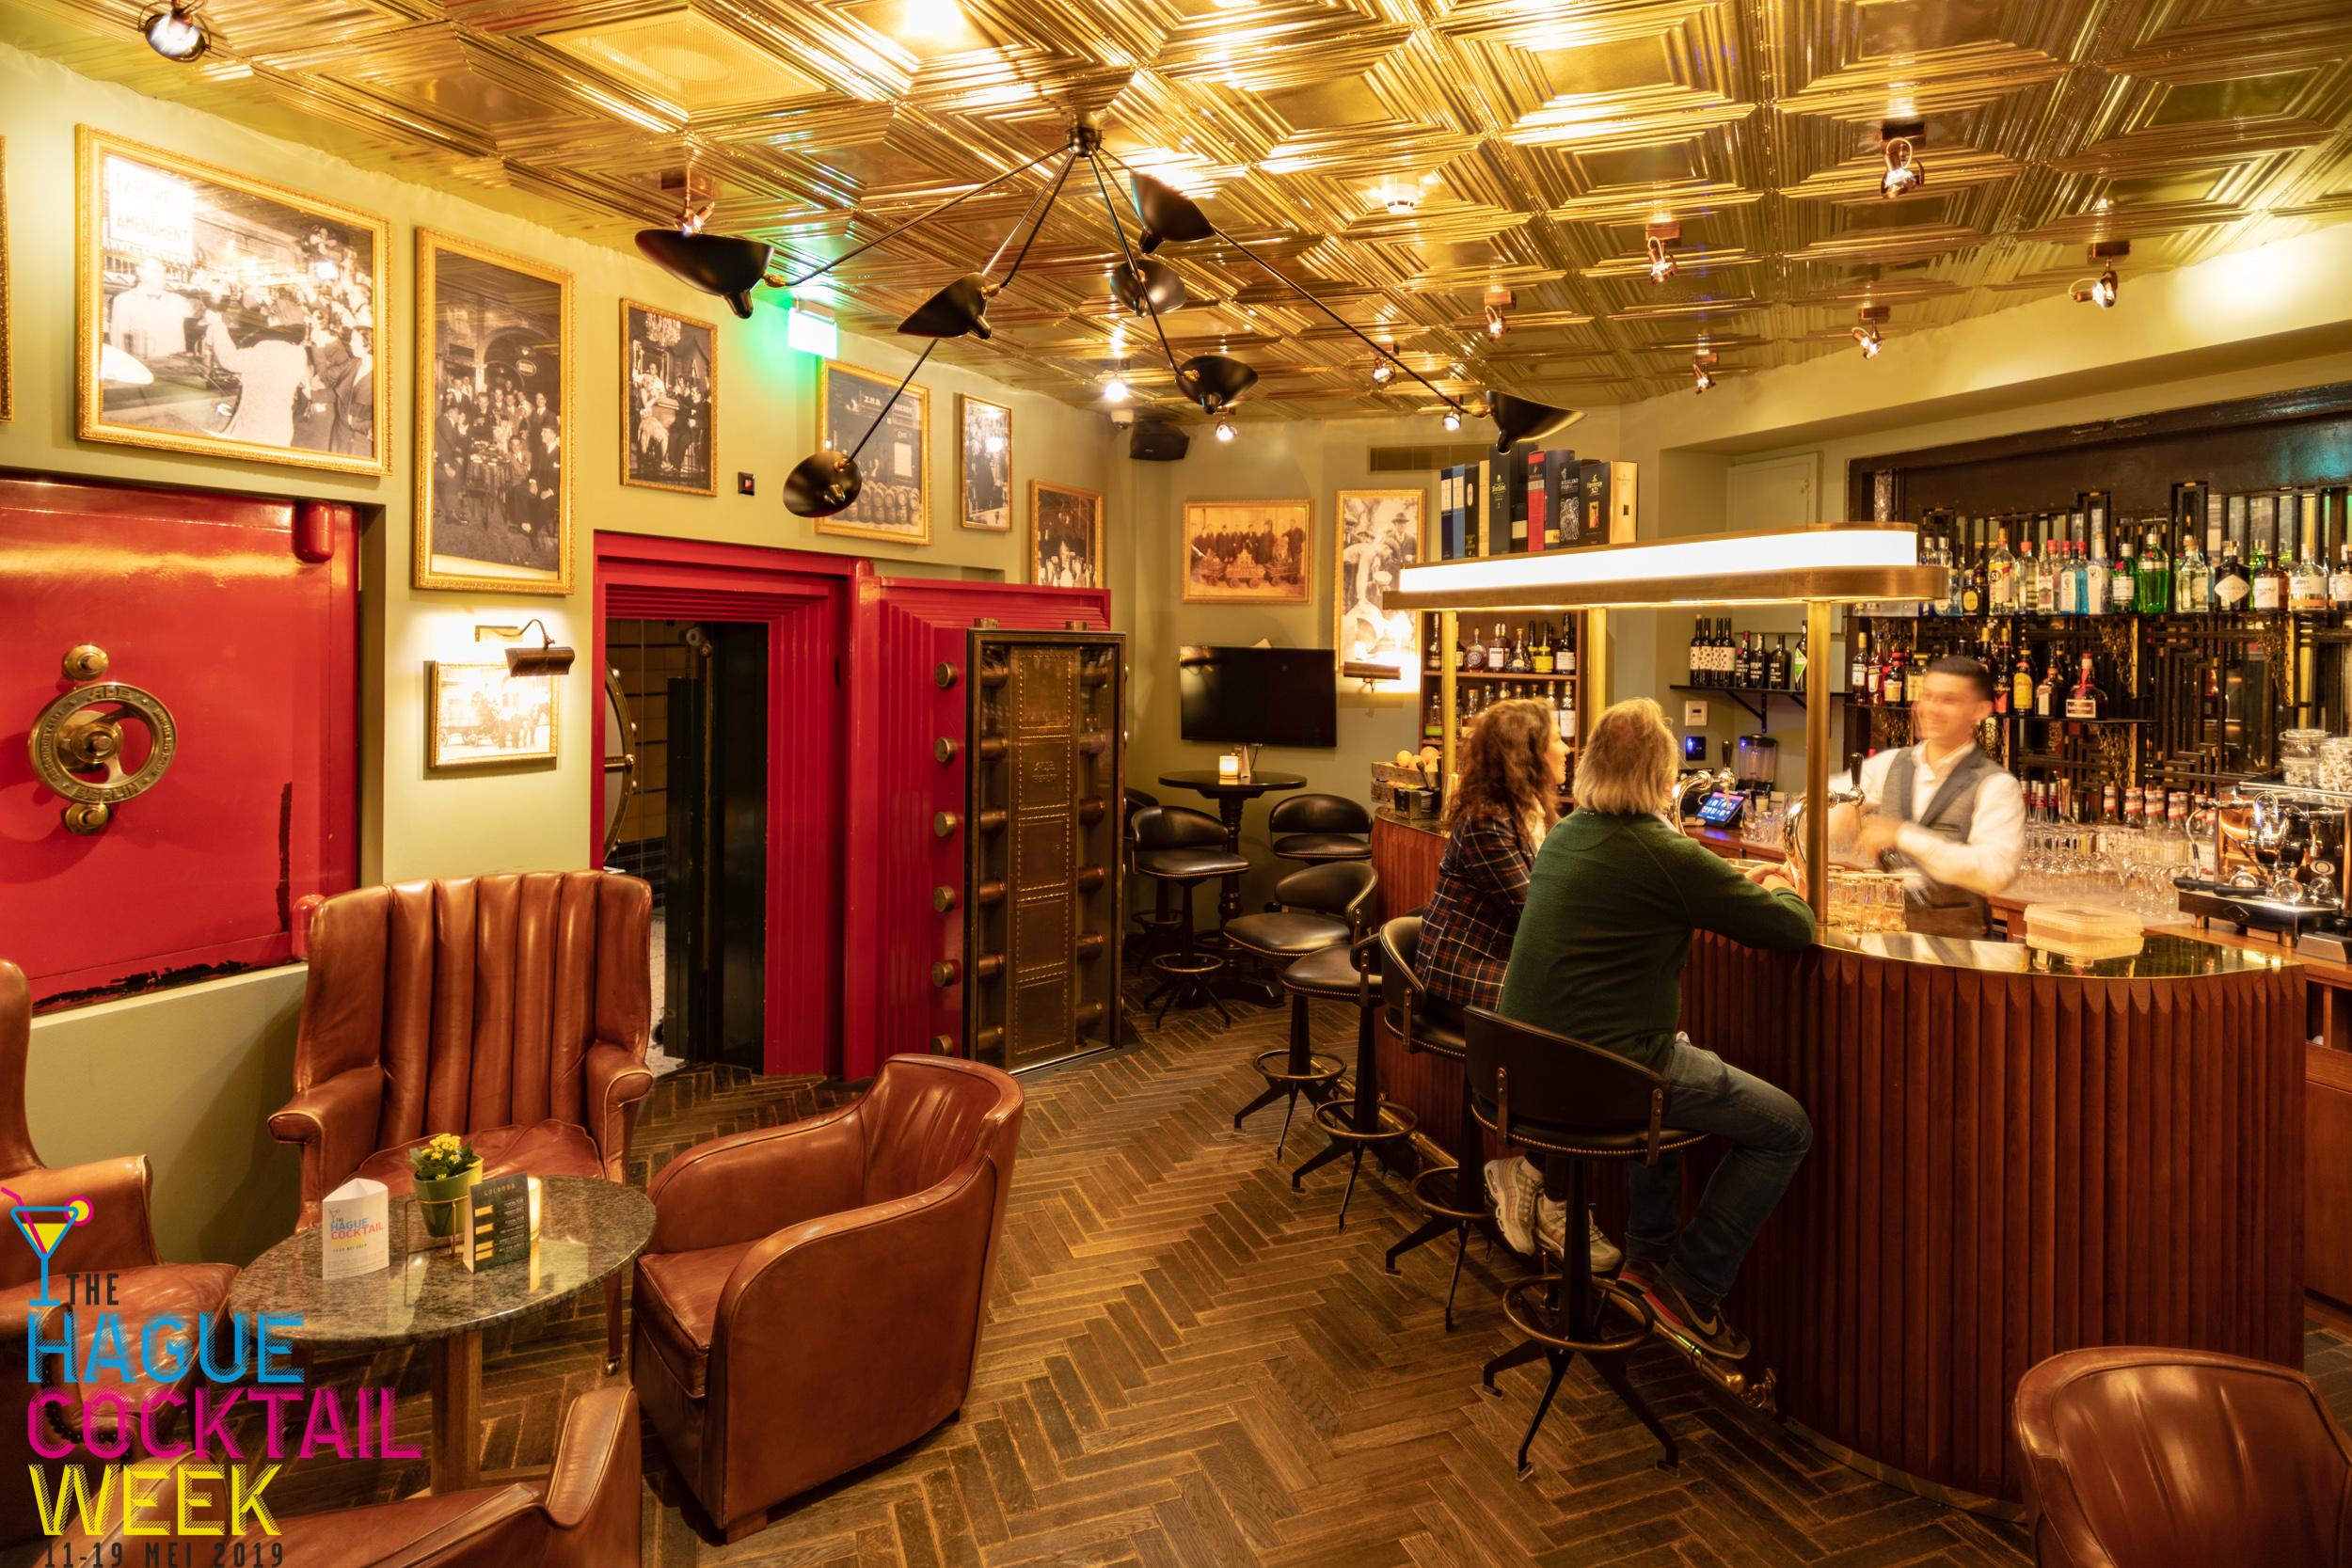 Gold Bar Indigo | The Hague Cocktailweek-7.jpg